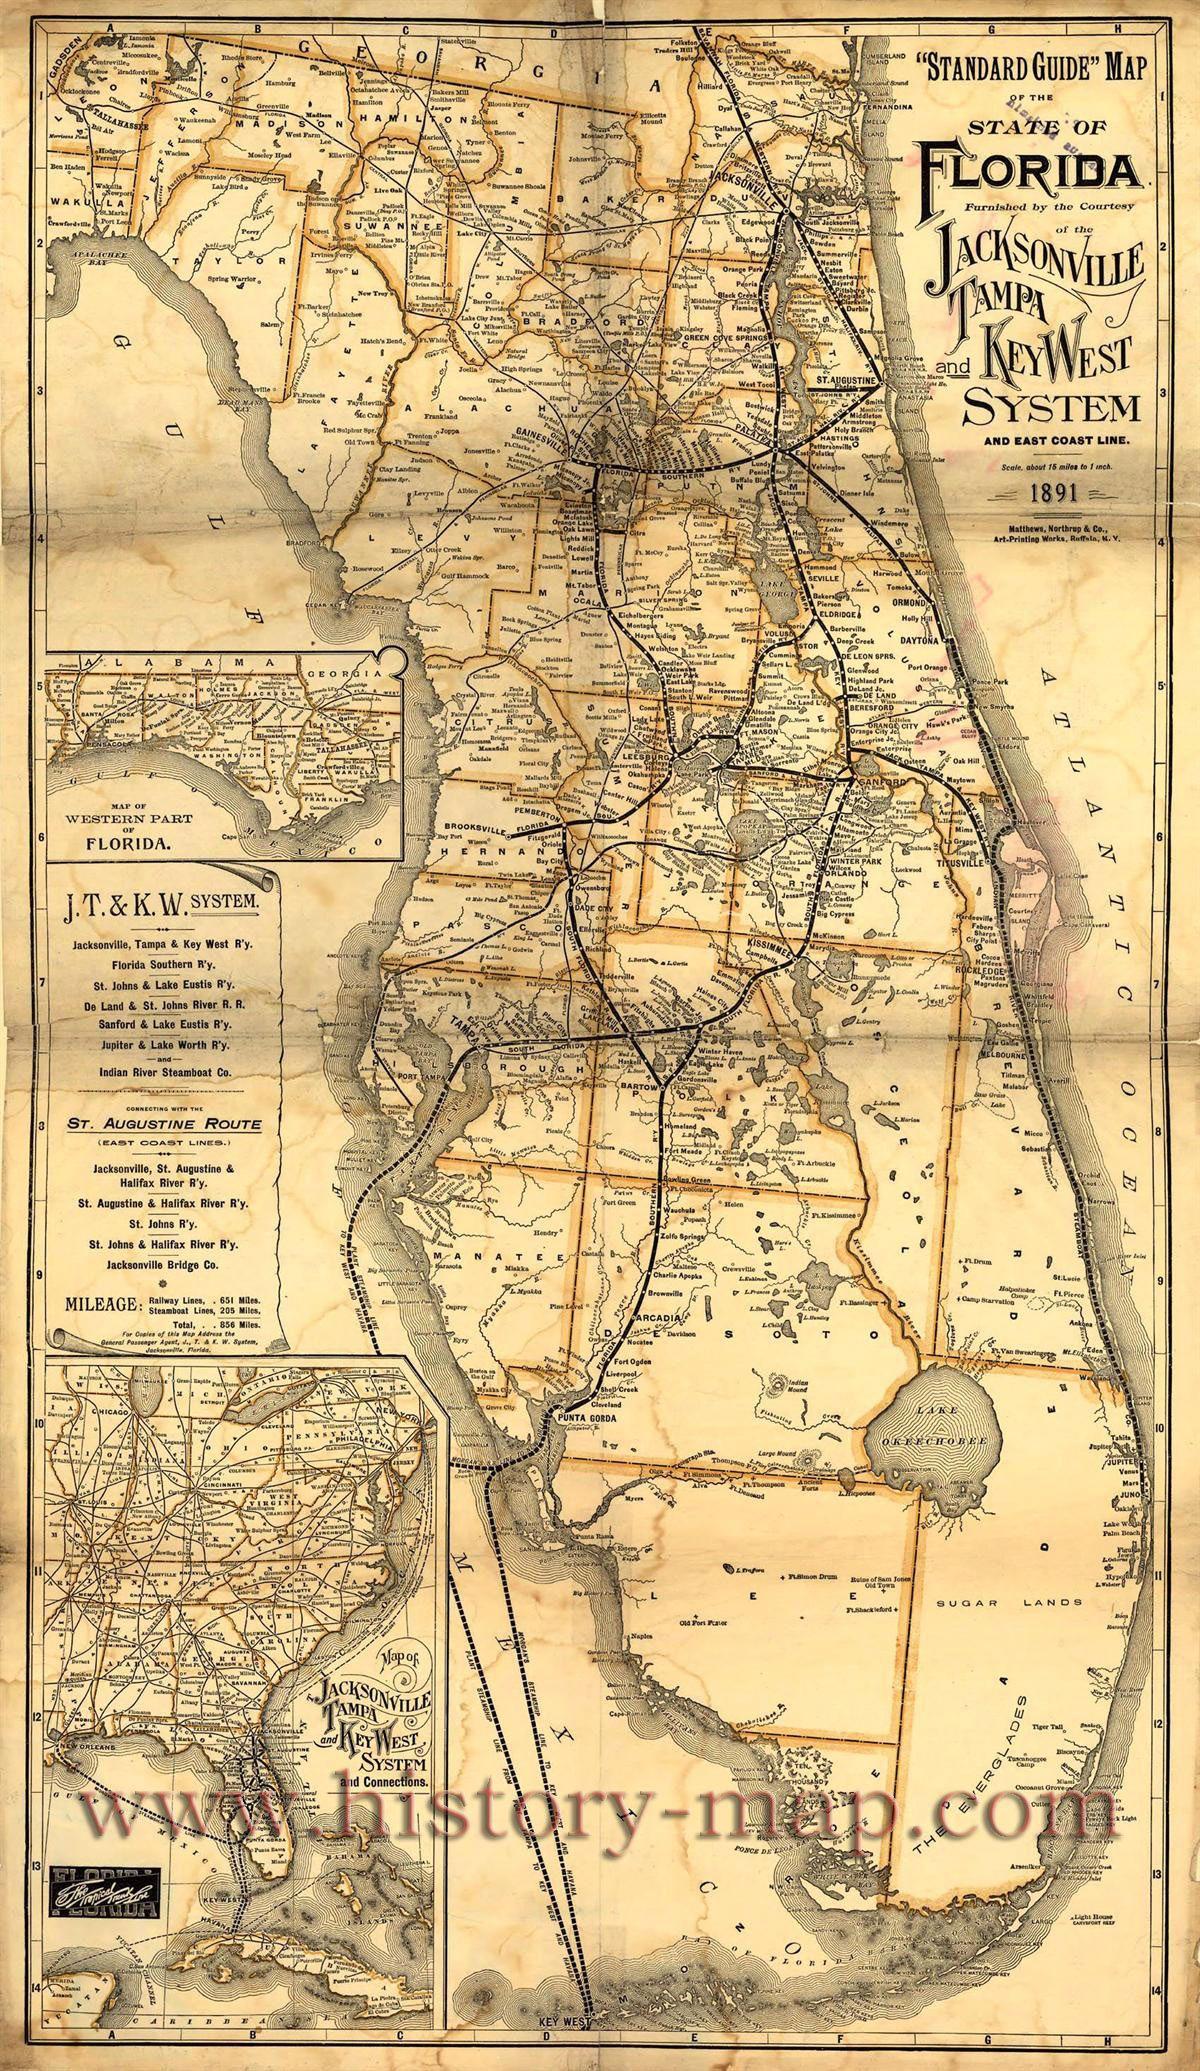 Florida | Florida In 2019 | Pinterest | Vintage Florida, Old Florida - Florida Old Map